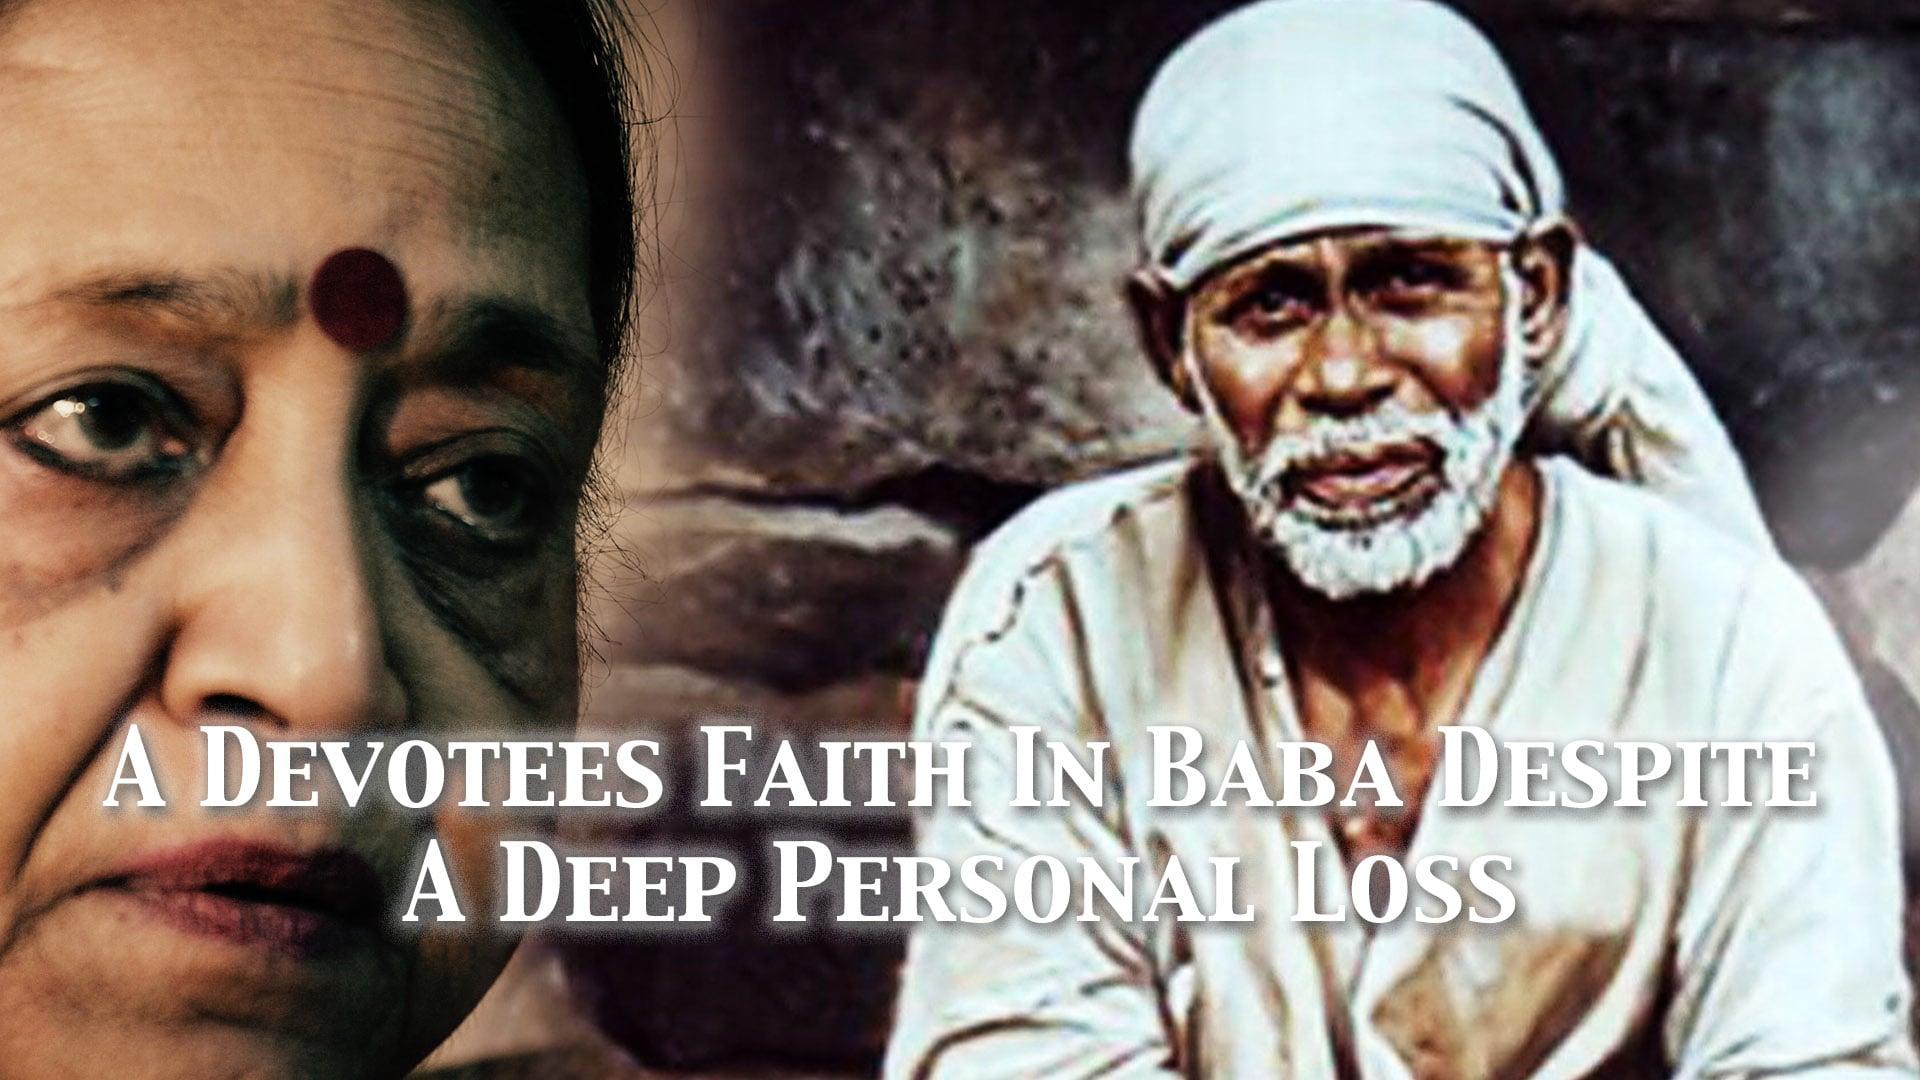 A Devotee's Faith in Baba Despite Deep Personal loss